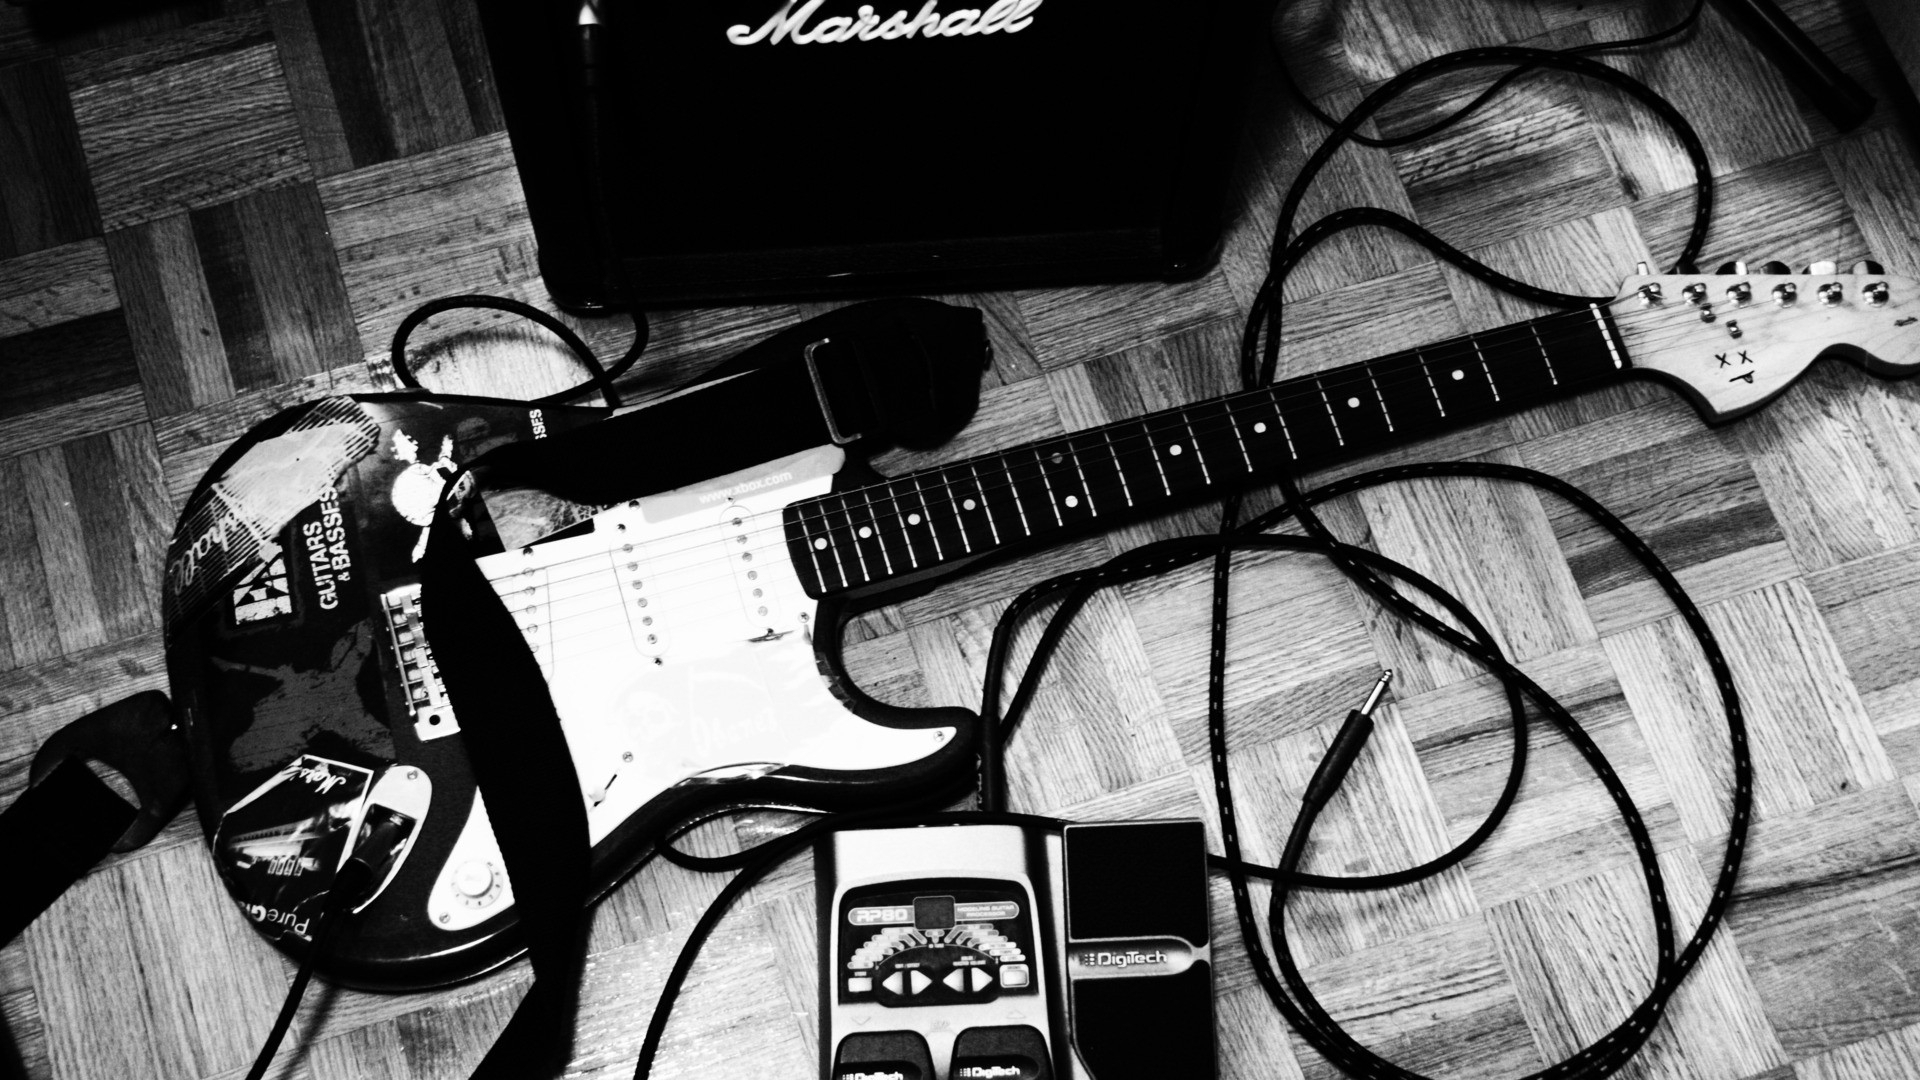 Rock N Roll Wallpaper Free High Resolution Images: Entertainment Music Guitars Black White Amp Strings Tech